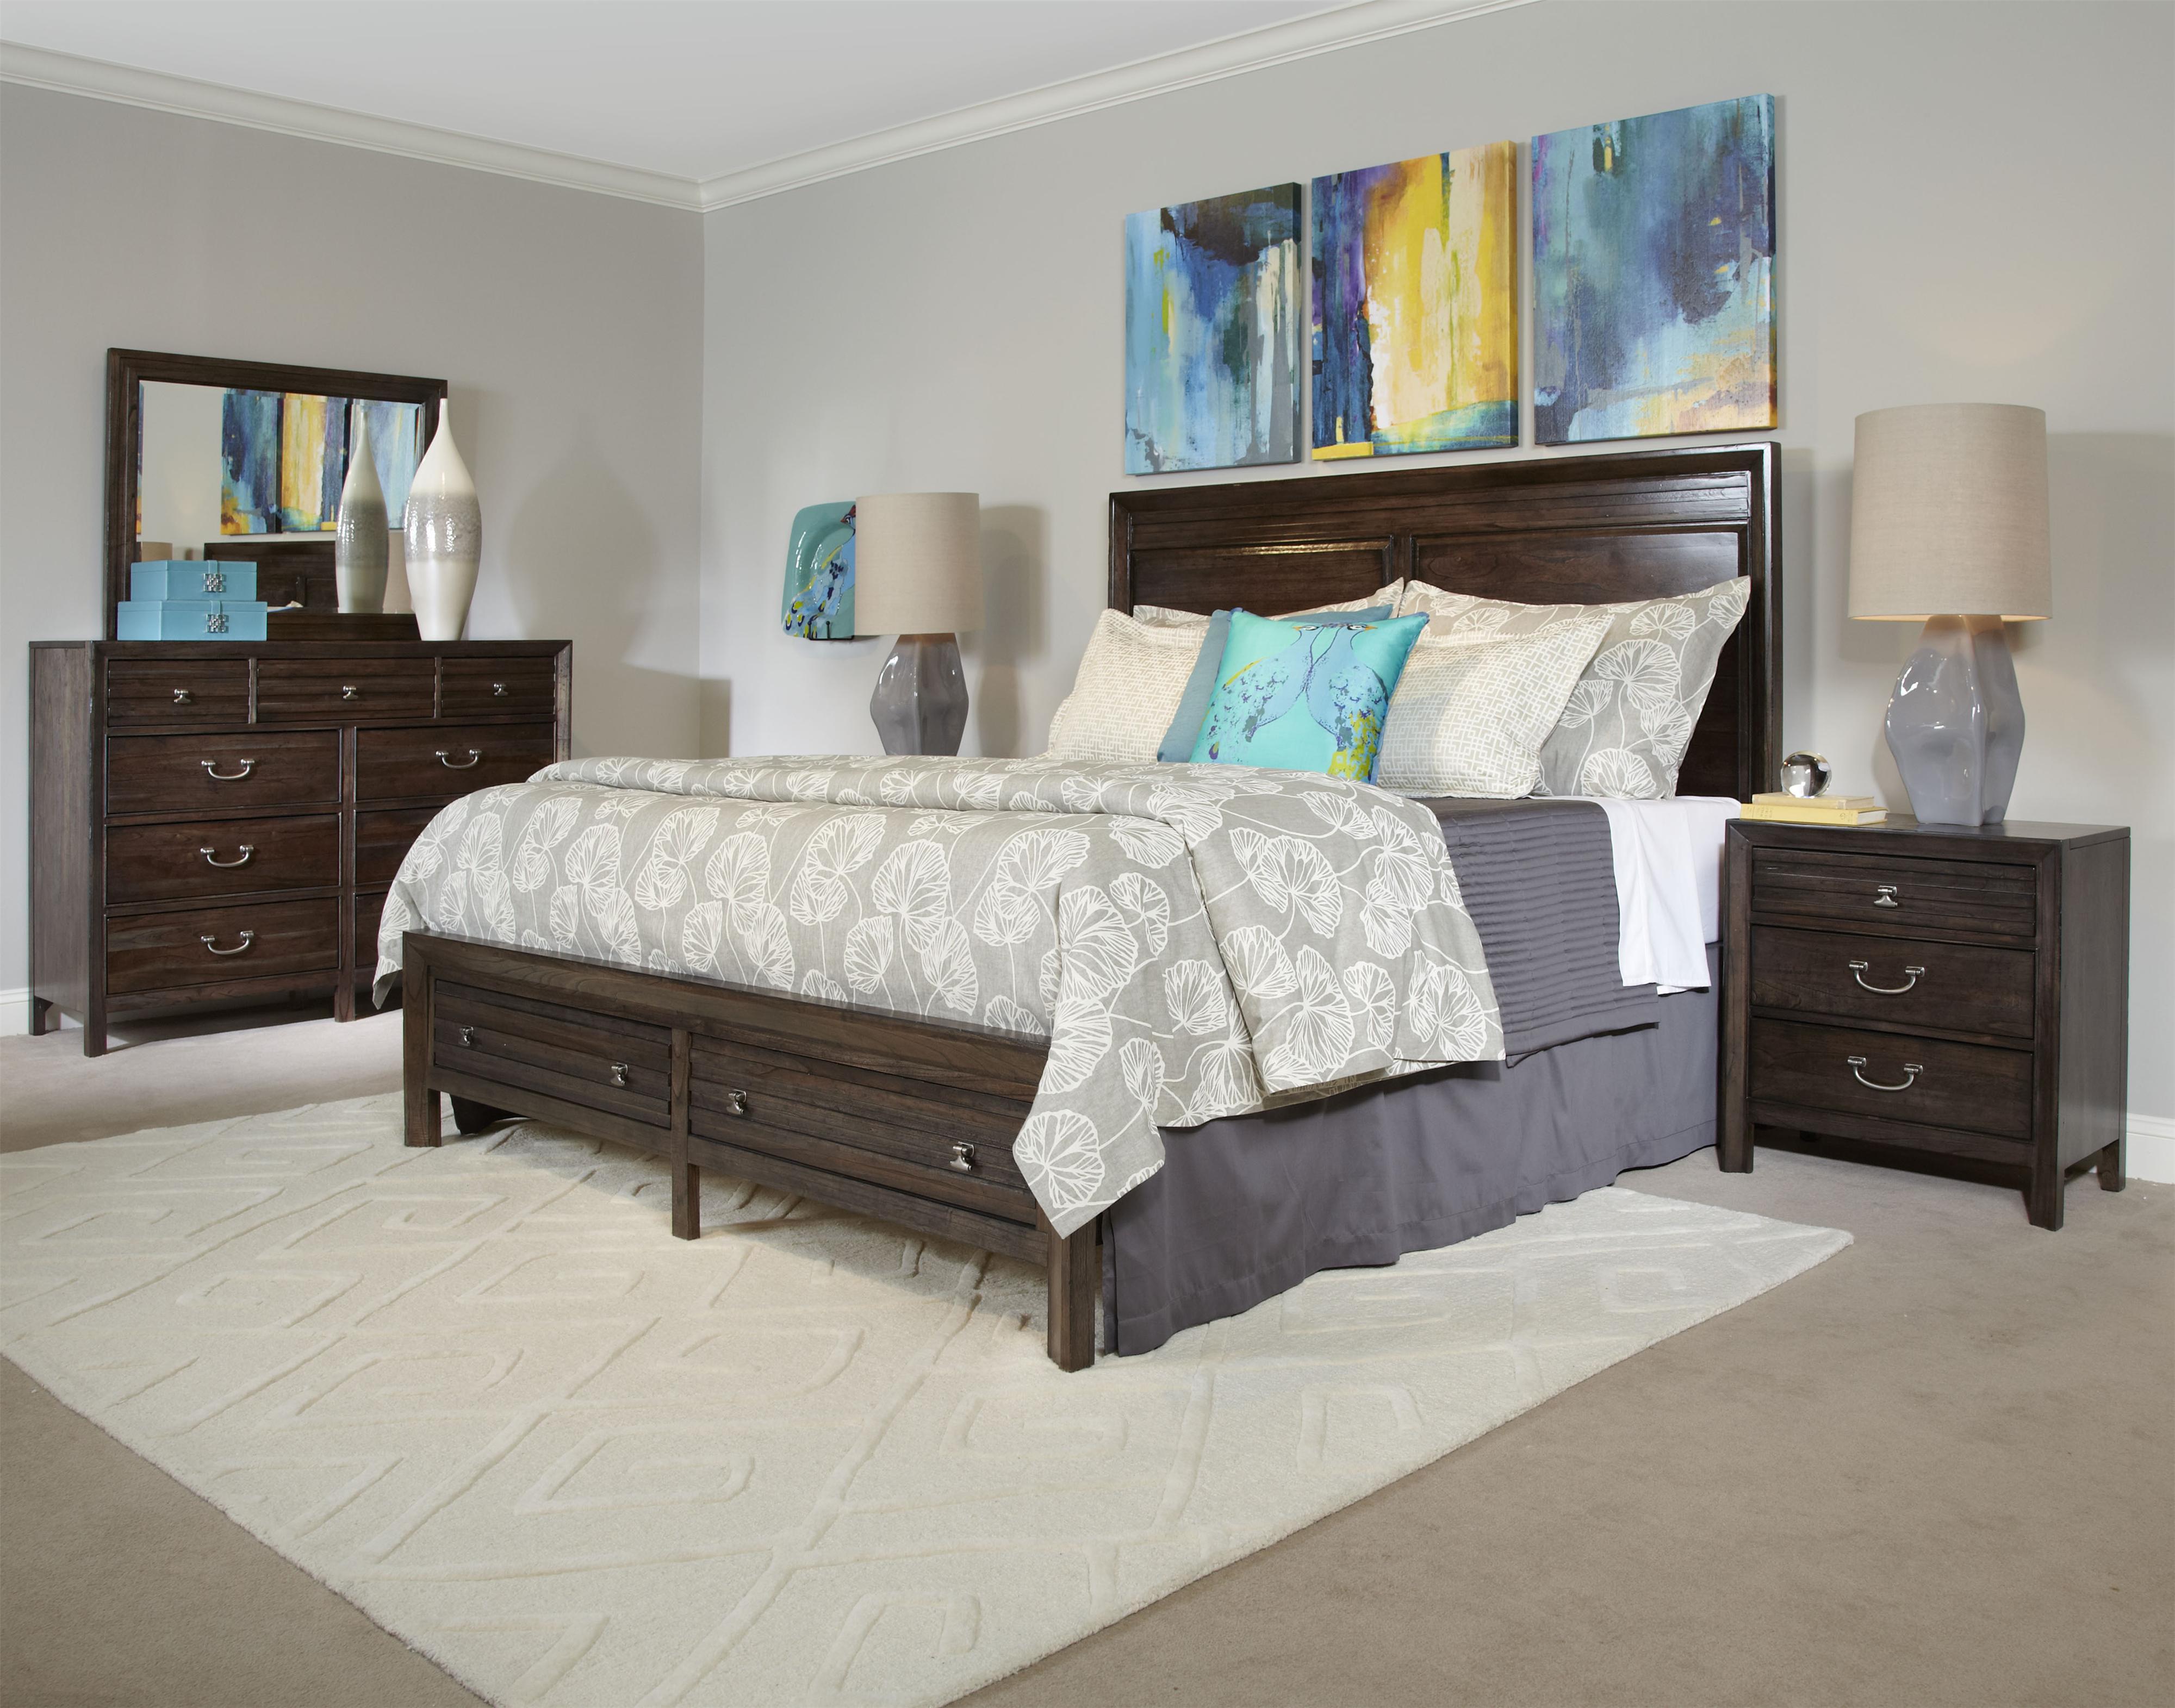 Kincaid furniture montreat contemporary black rock bureau for Kincaid american journal bedroom furniture